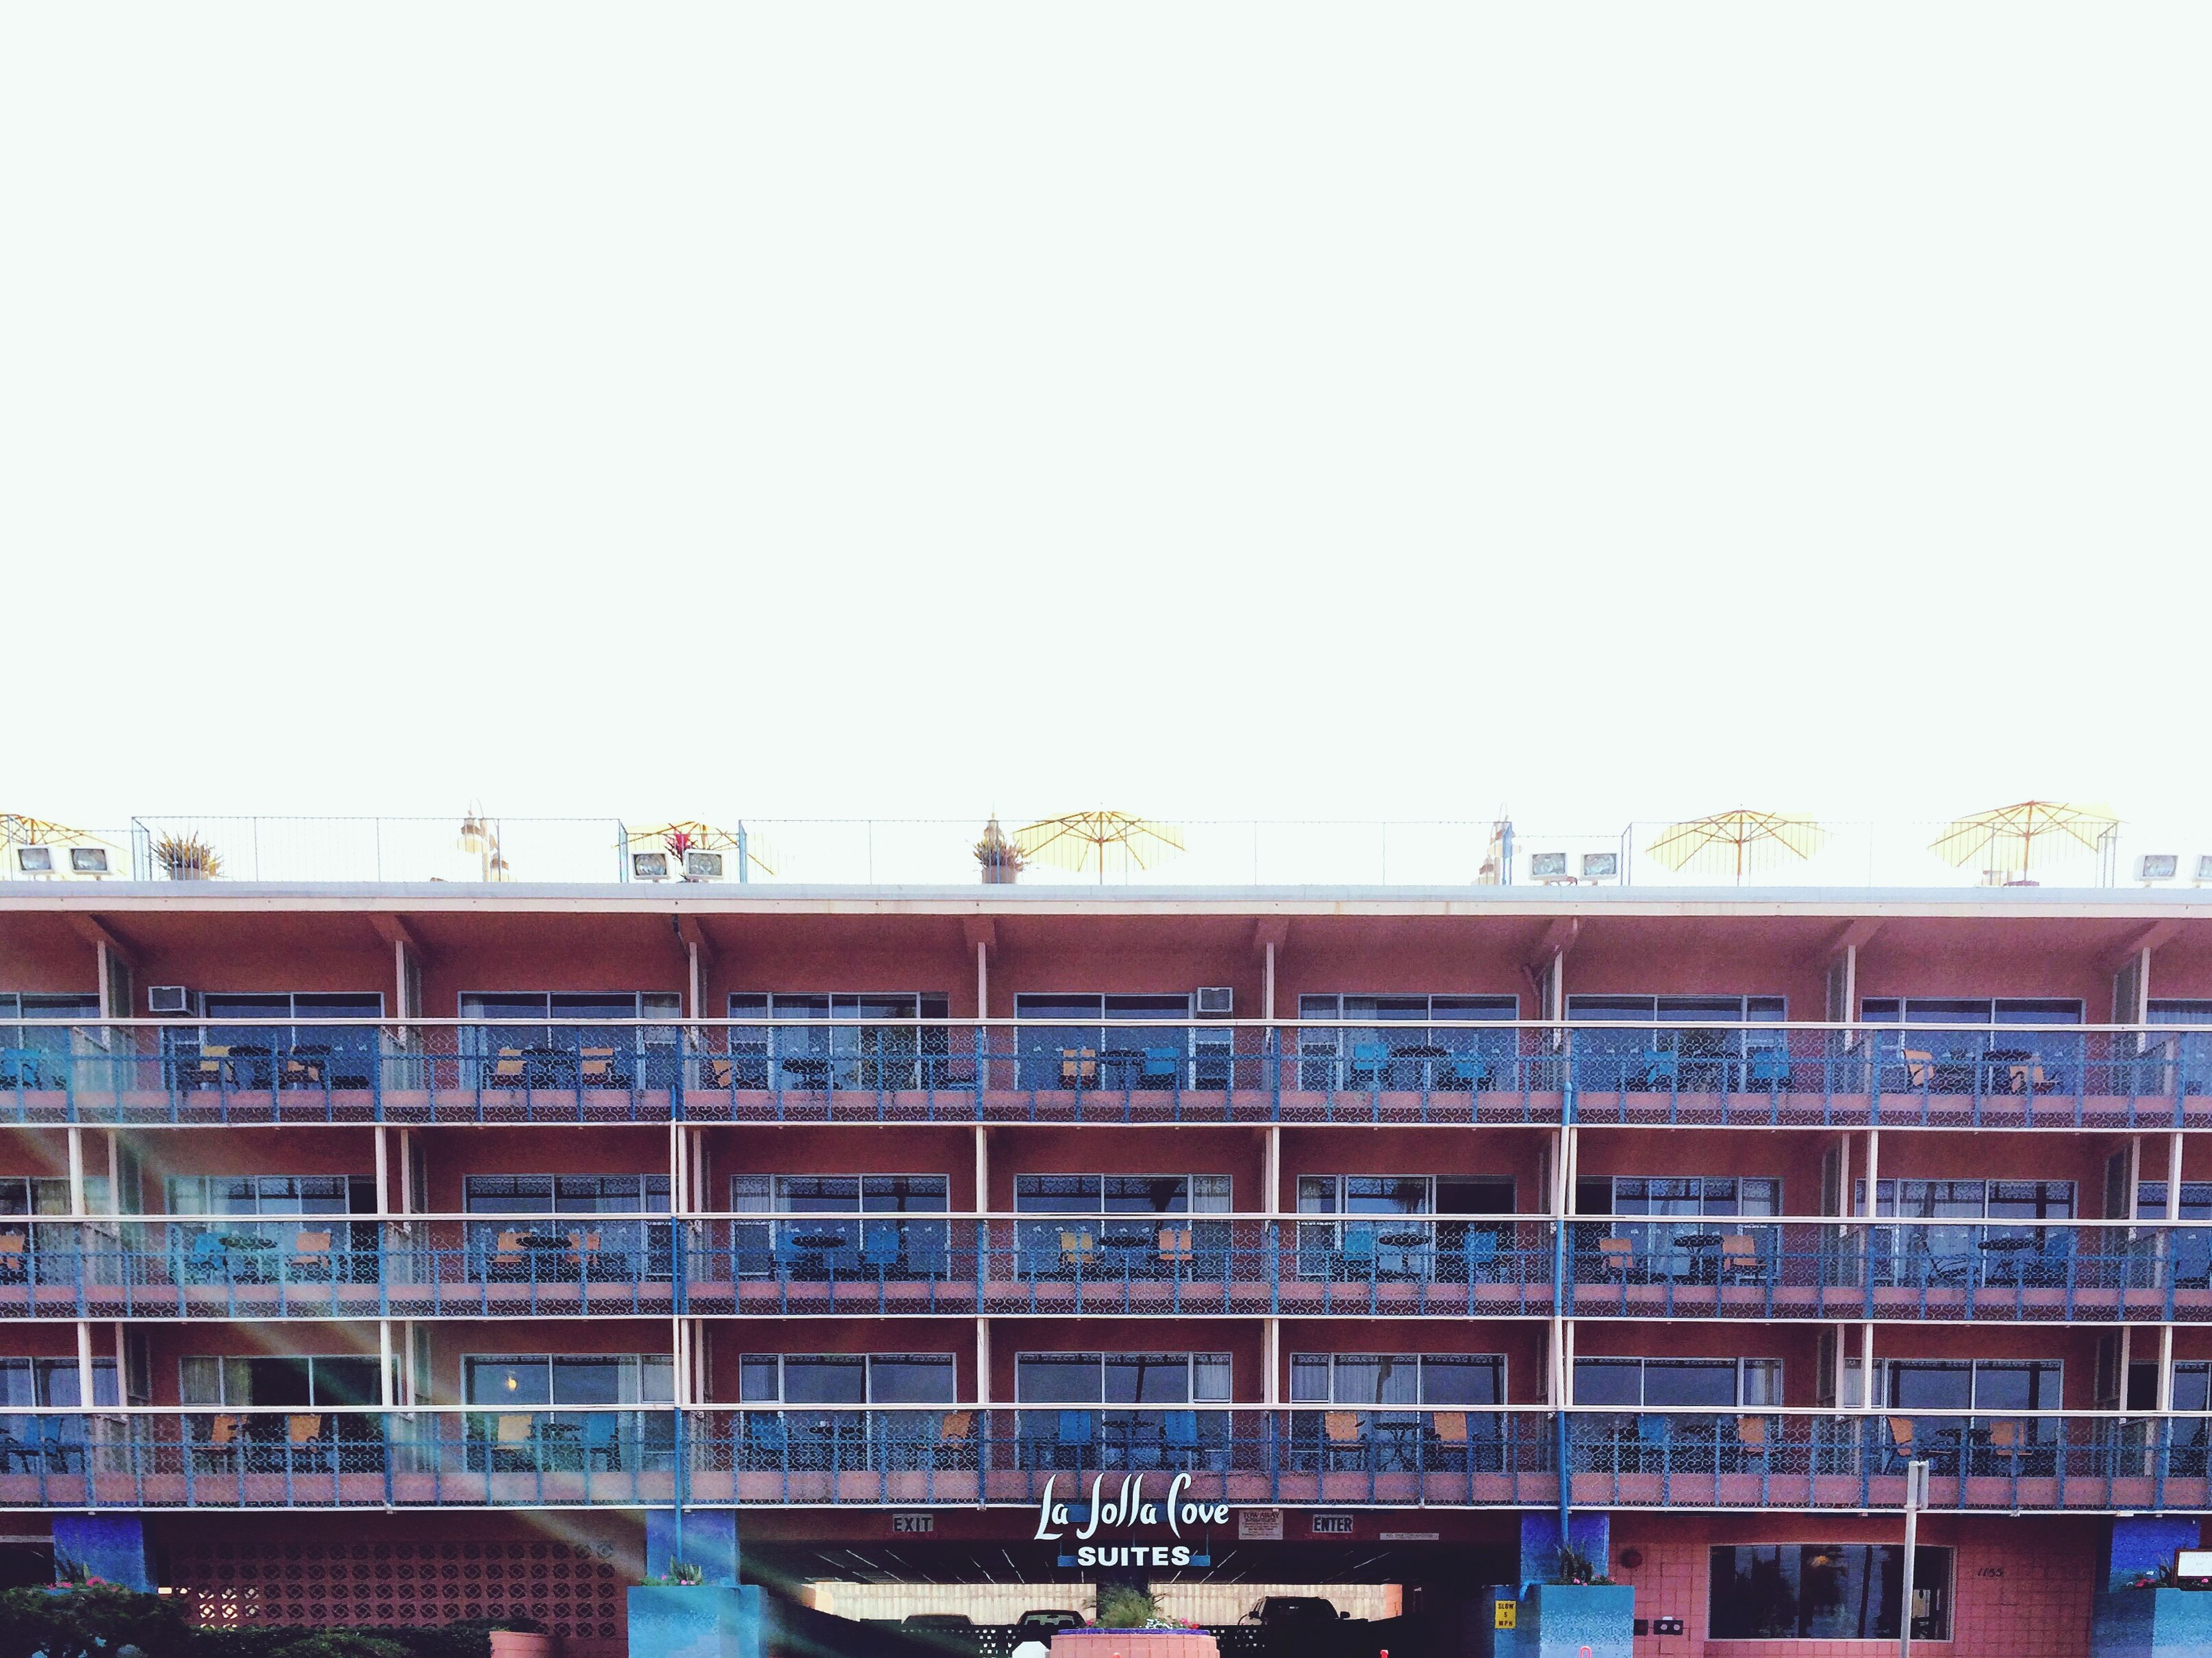 Welcome to the hotel California Lajollacove Lajolla California The Traveler - 2015 EyeEm Awards The Architect - 2015 EyeEm Awards